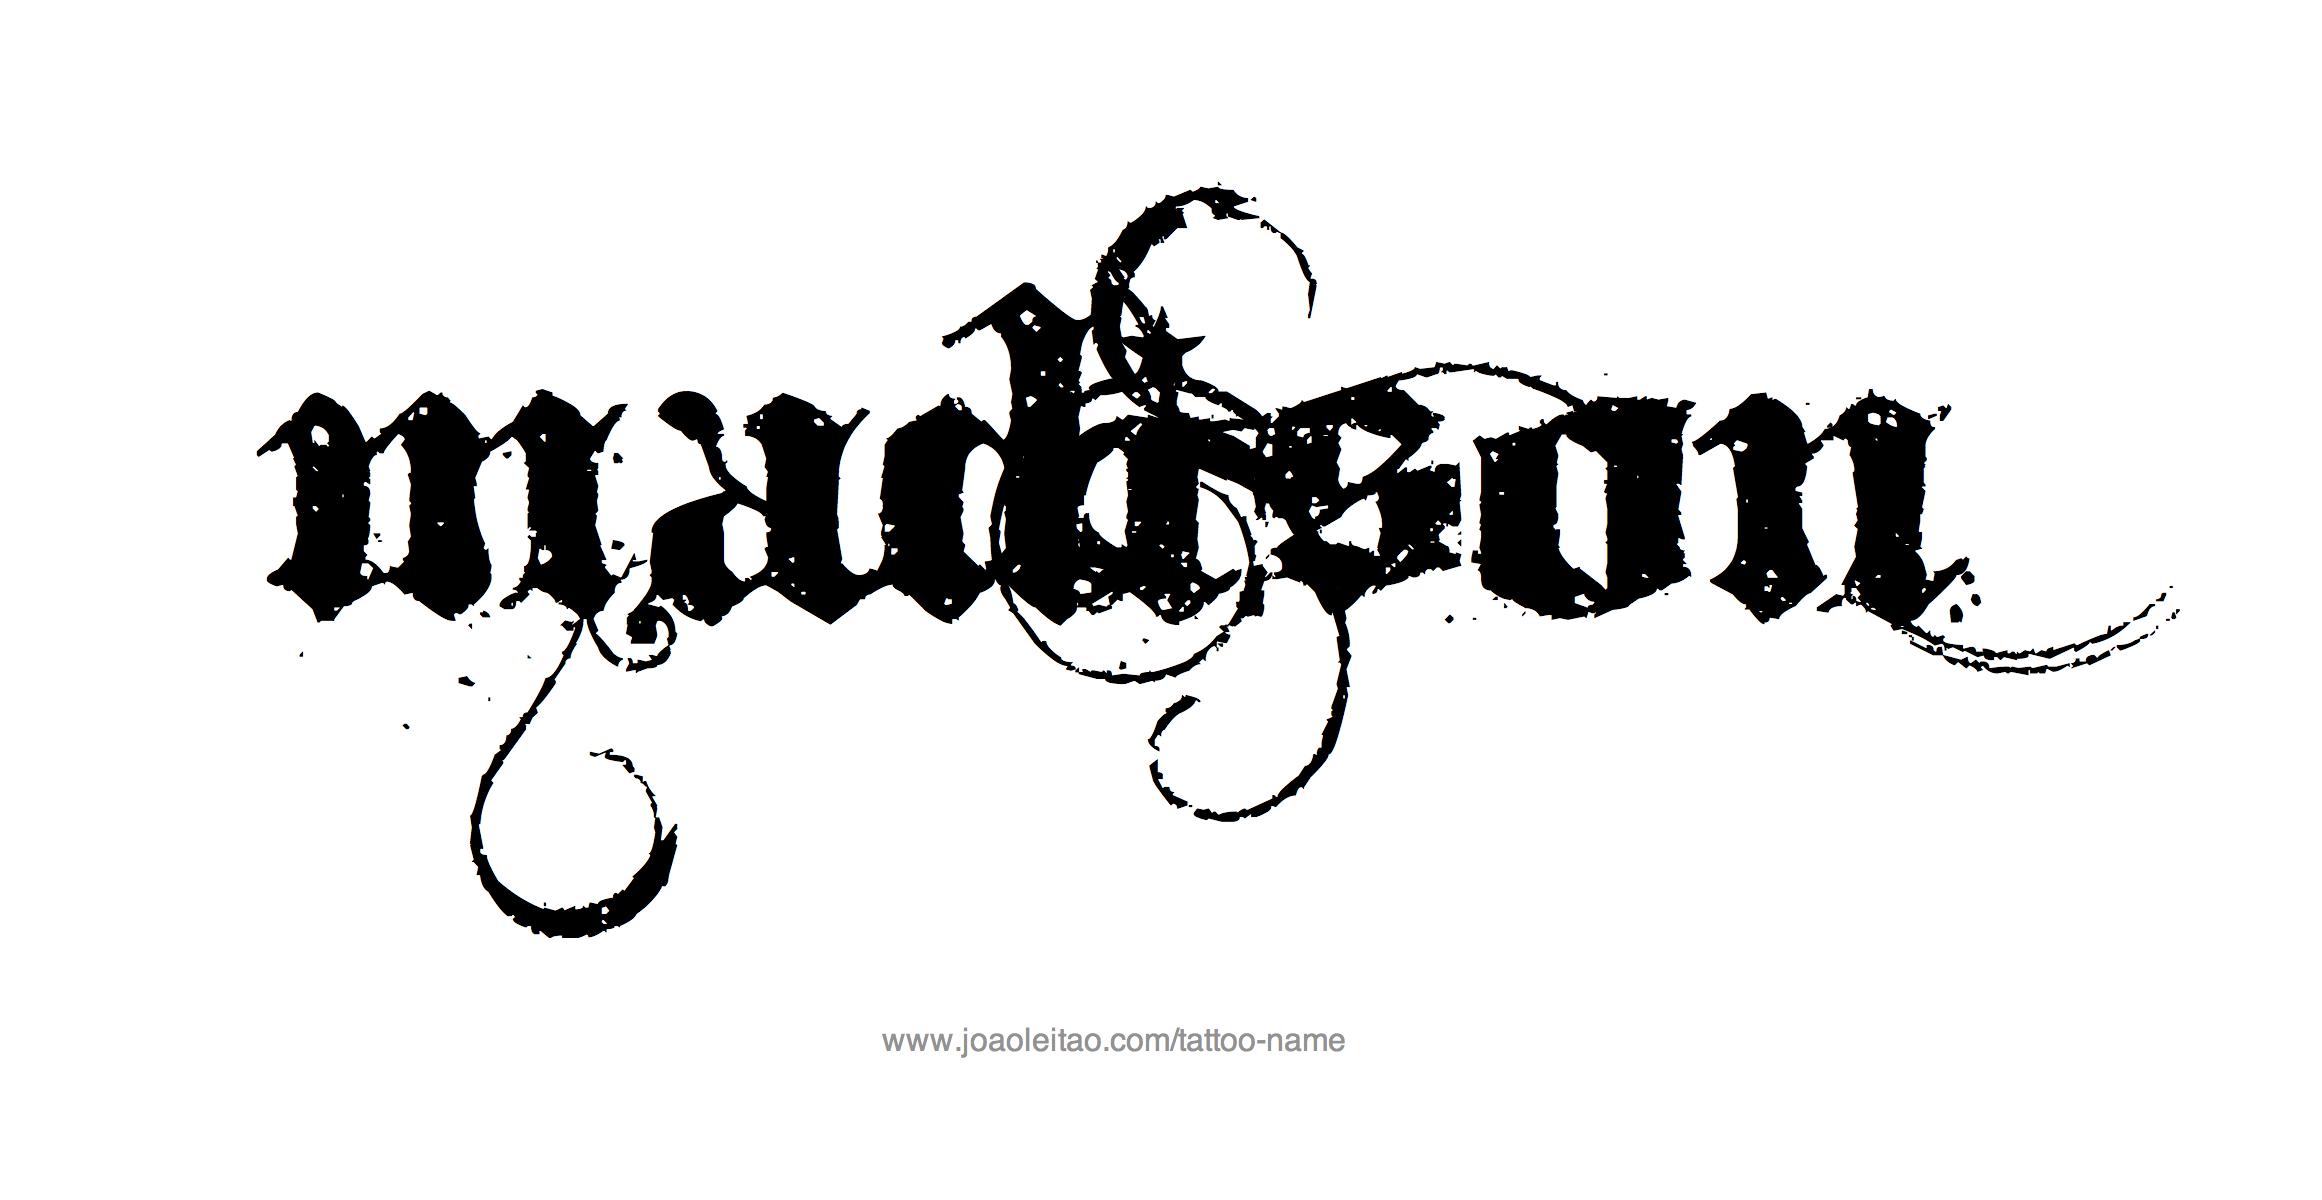 Madison Name Tattoo Designs Name Tattoos Madison Name Baby Name Tattoos